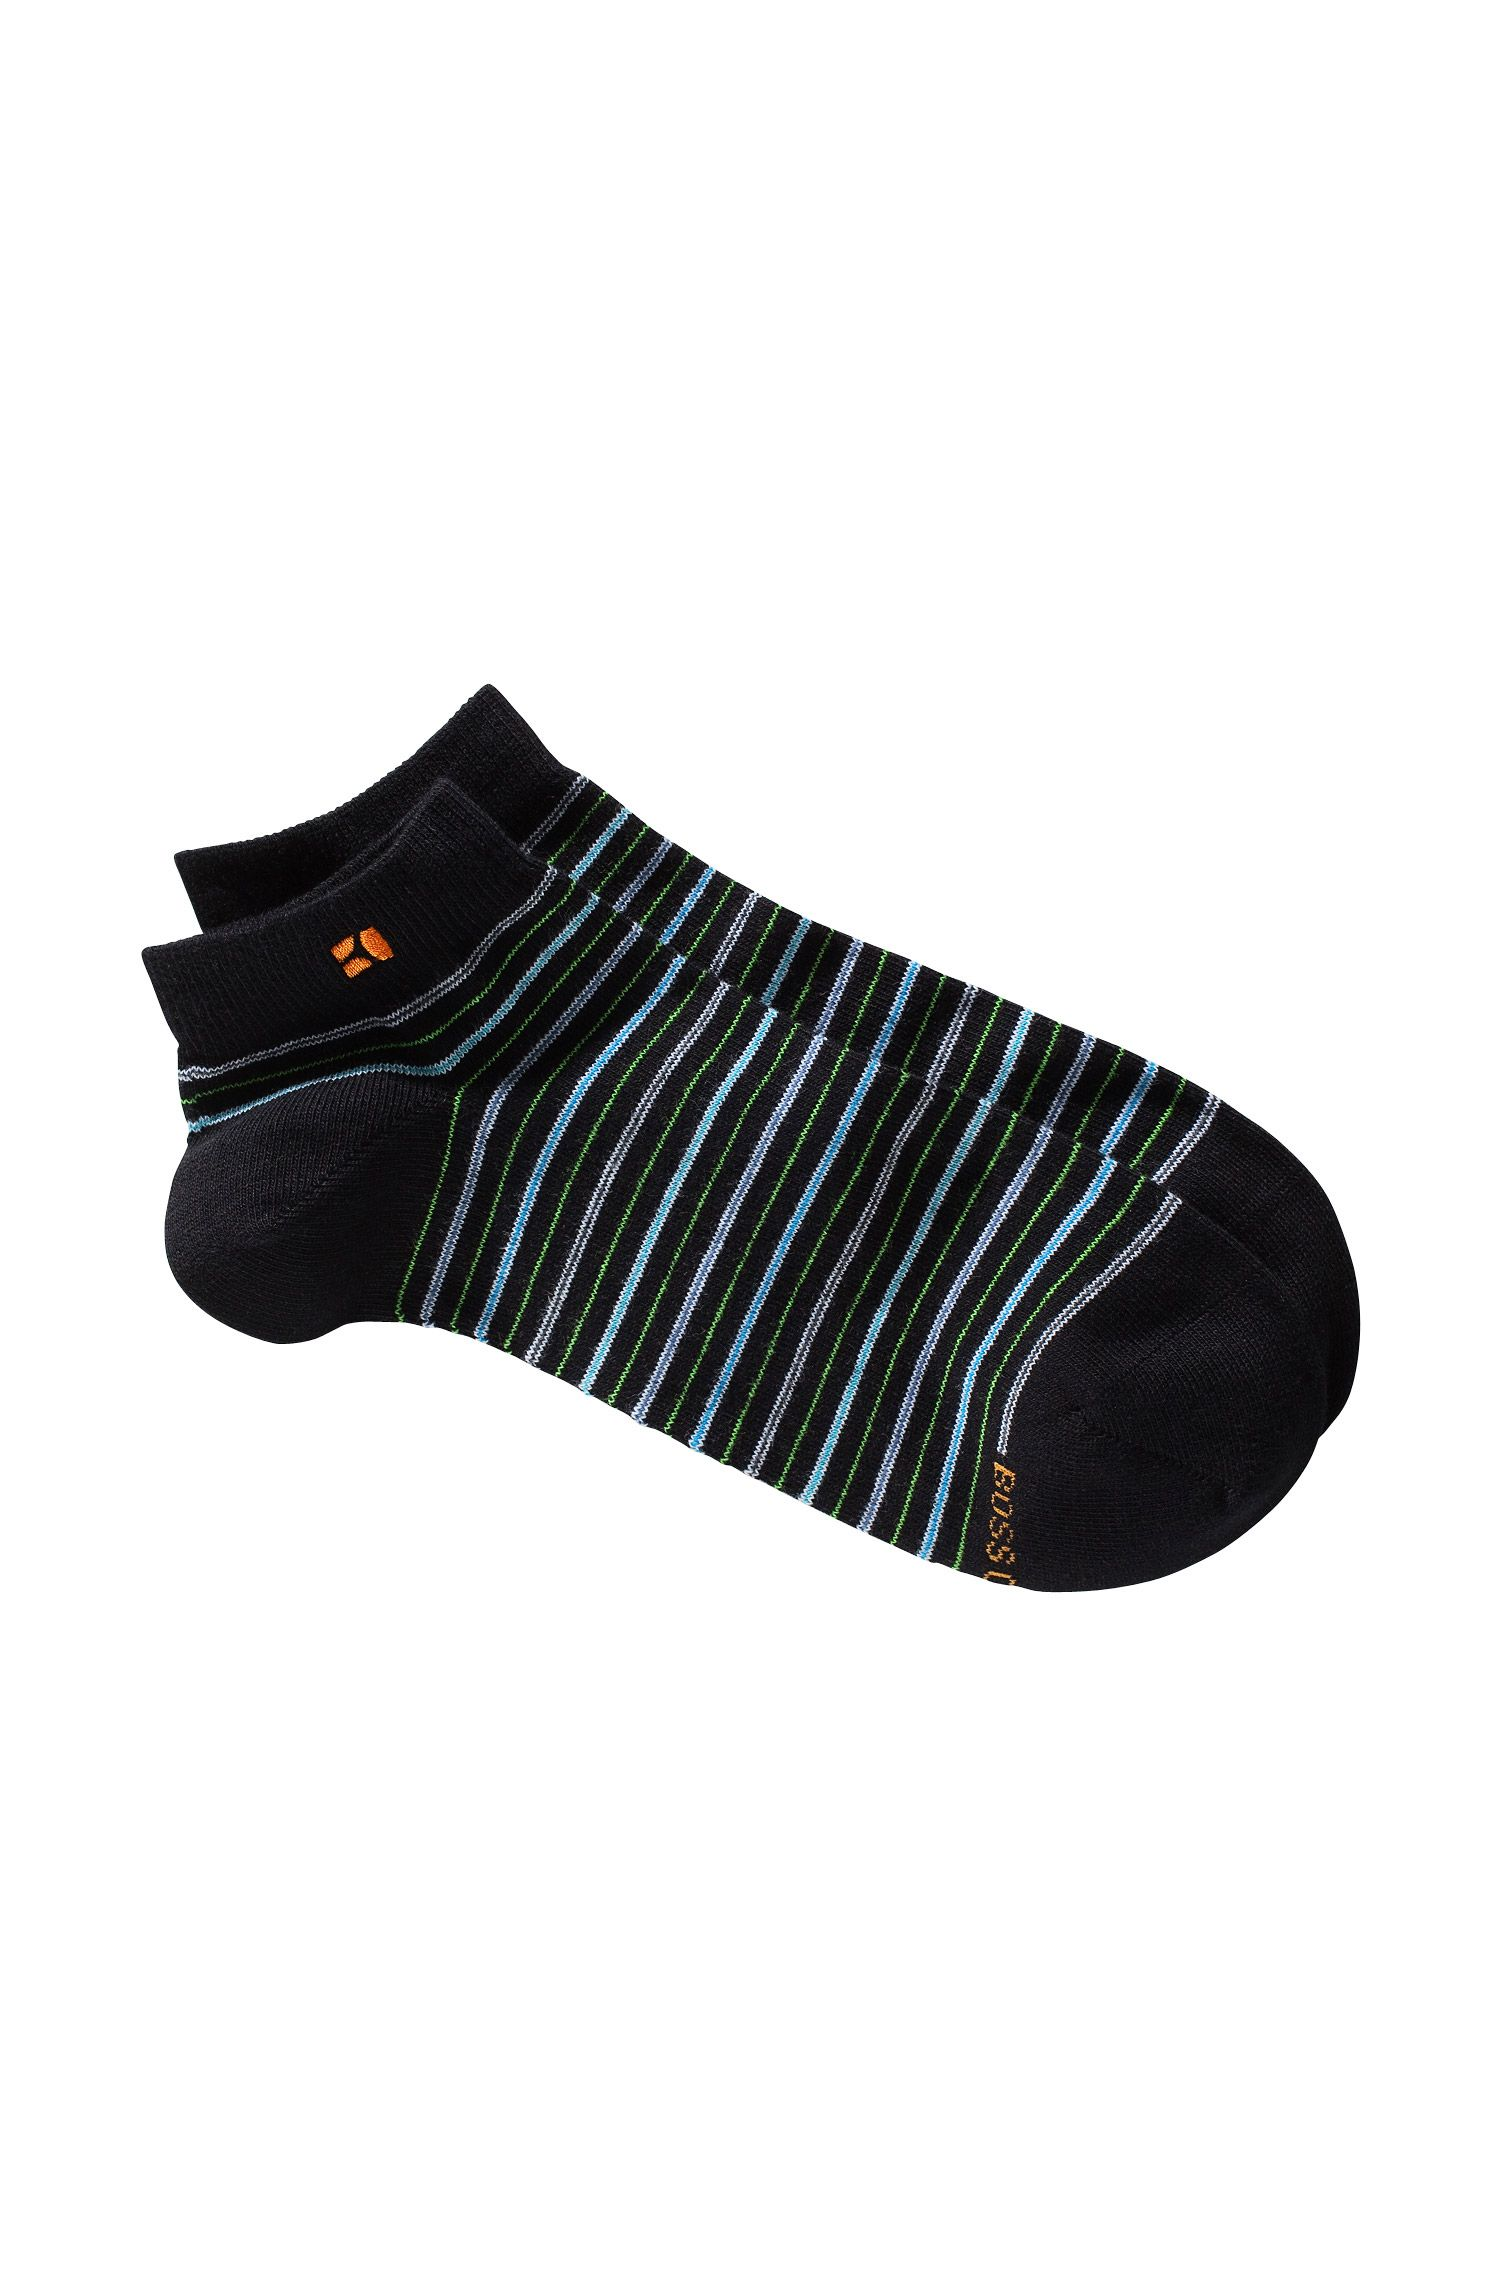 Striped, designer socks 'AS Design'